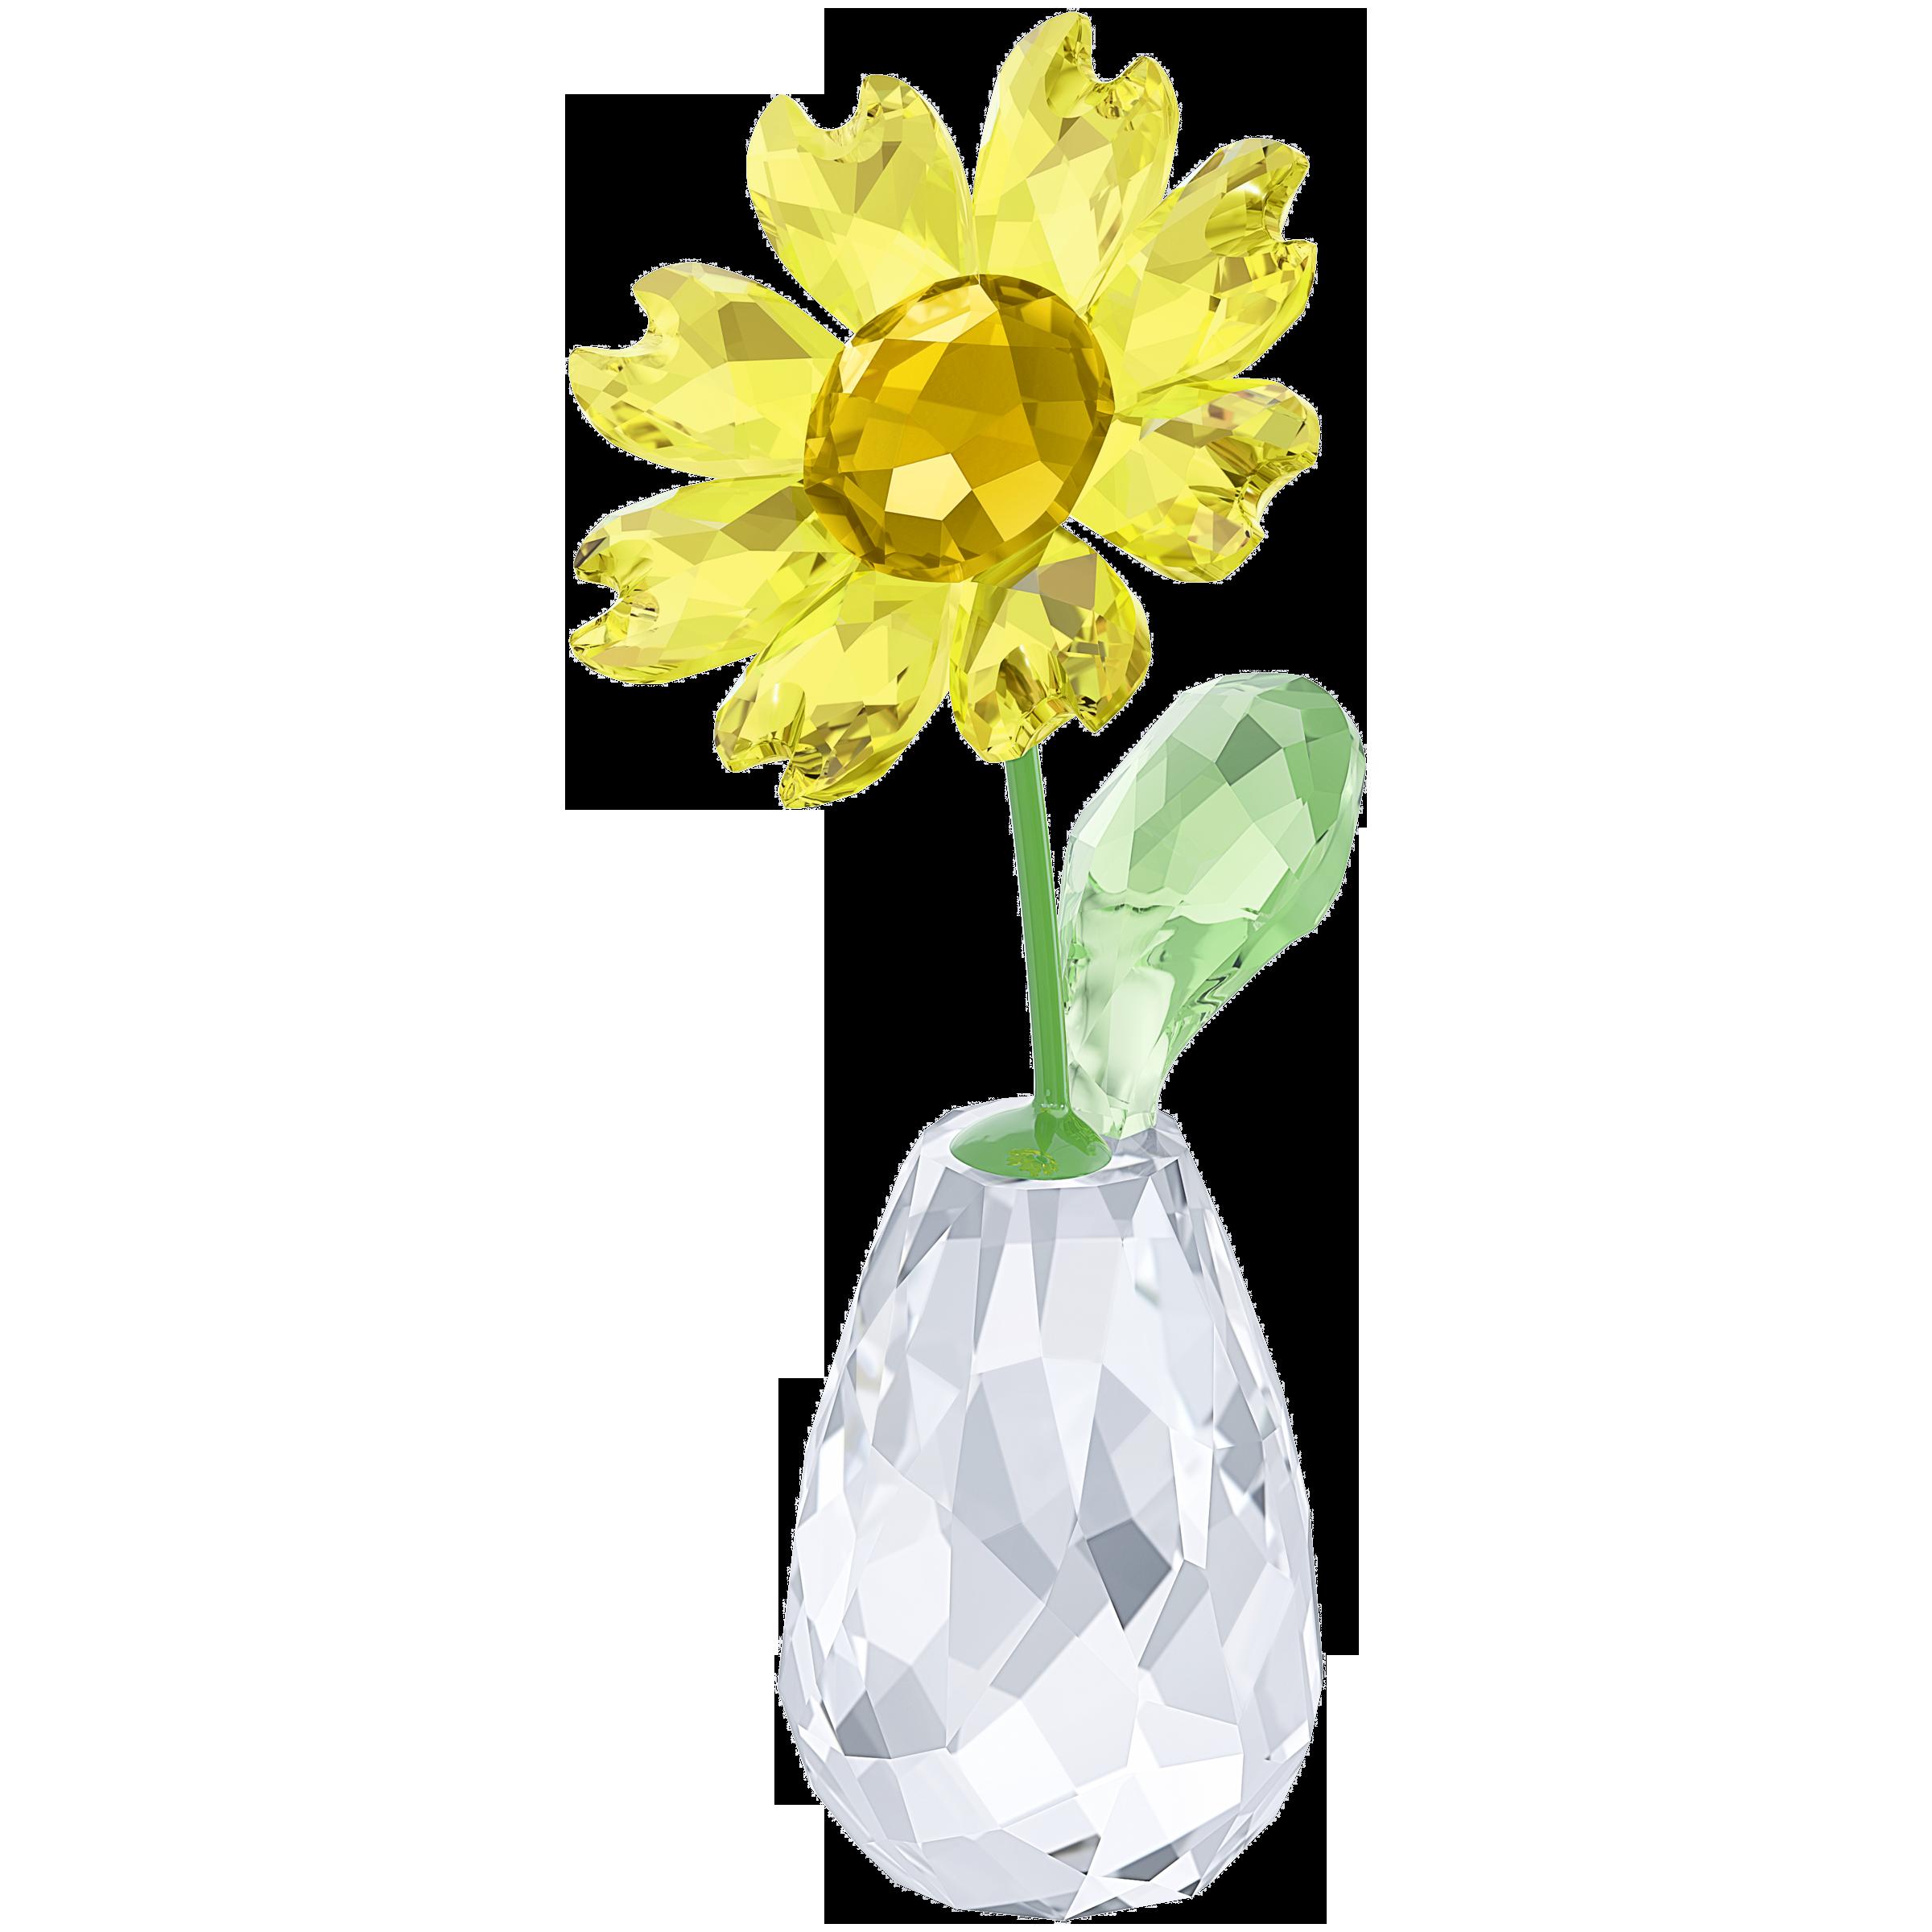 Flower Dreams - Sunflower